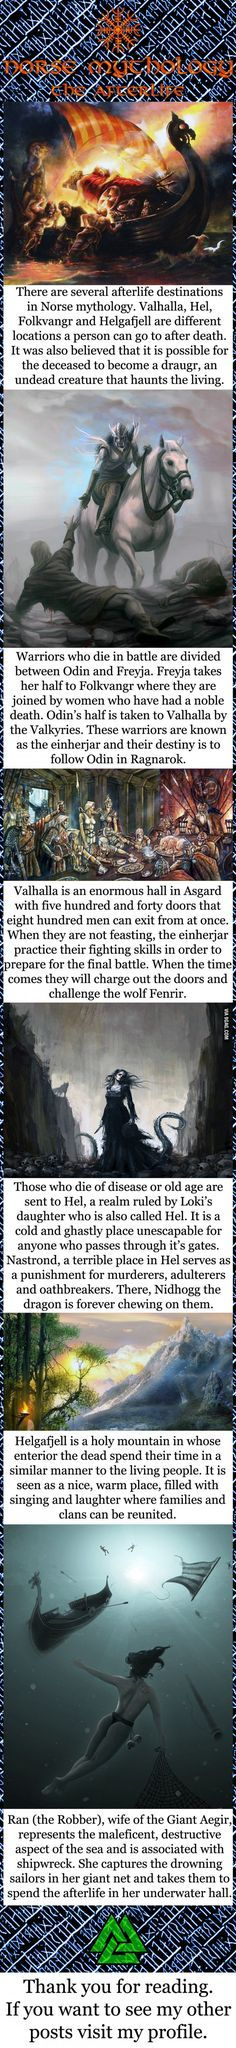 Norse mythology - The Afterlife